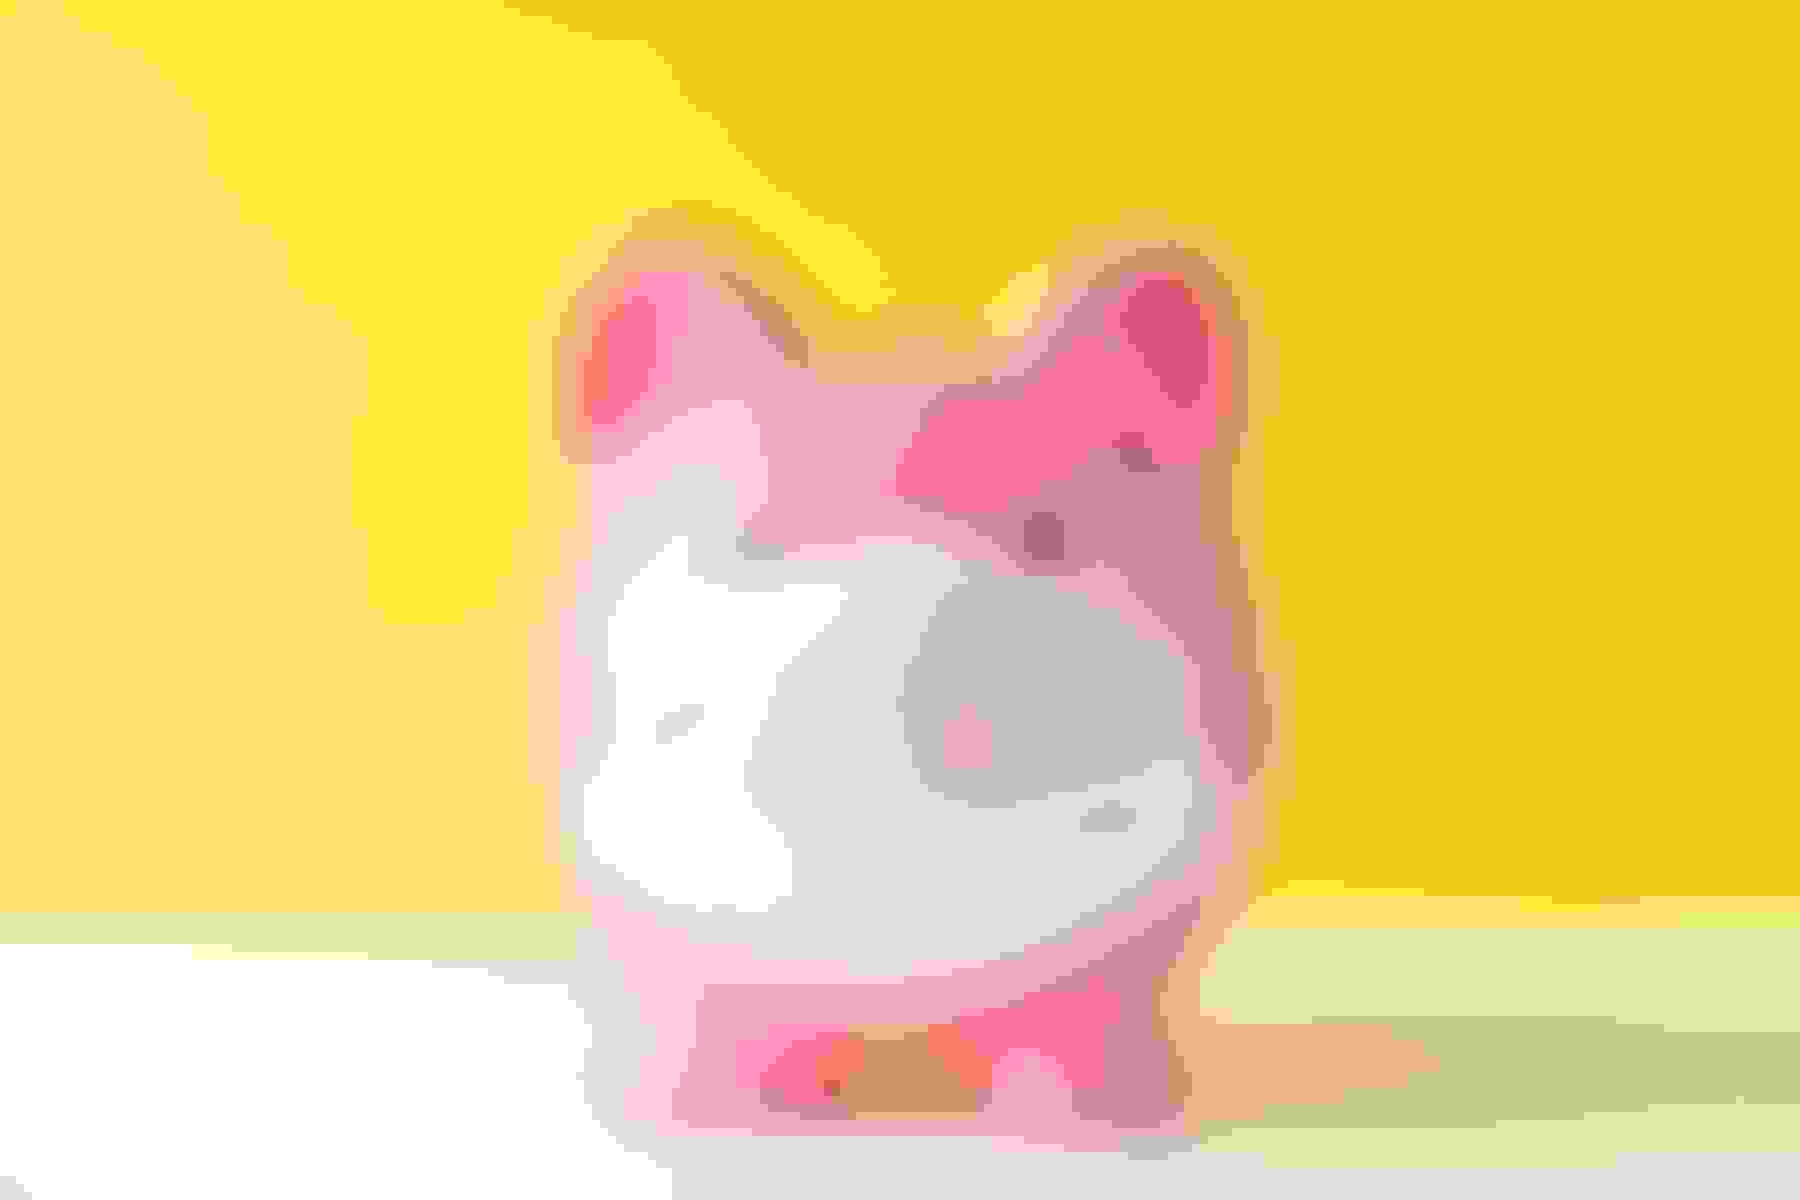 A piggy bank wearing a surgical mask